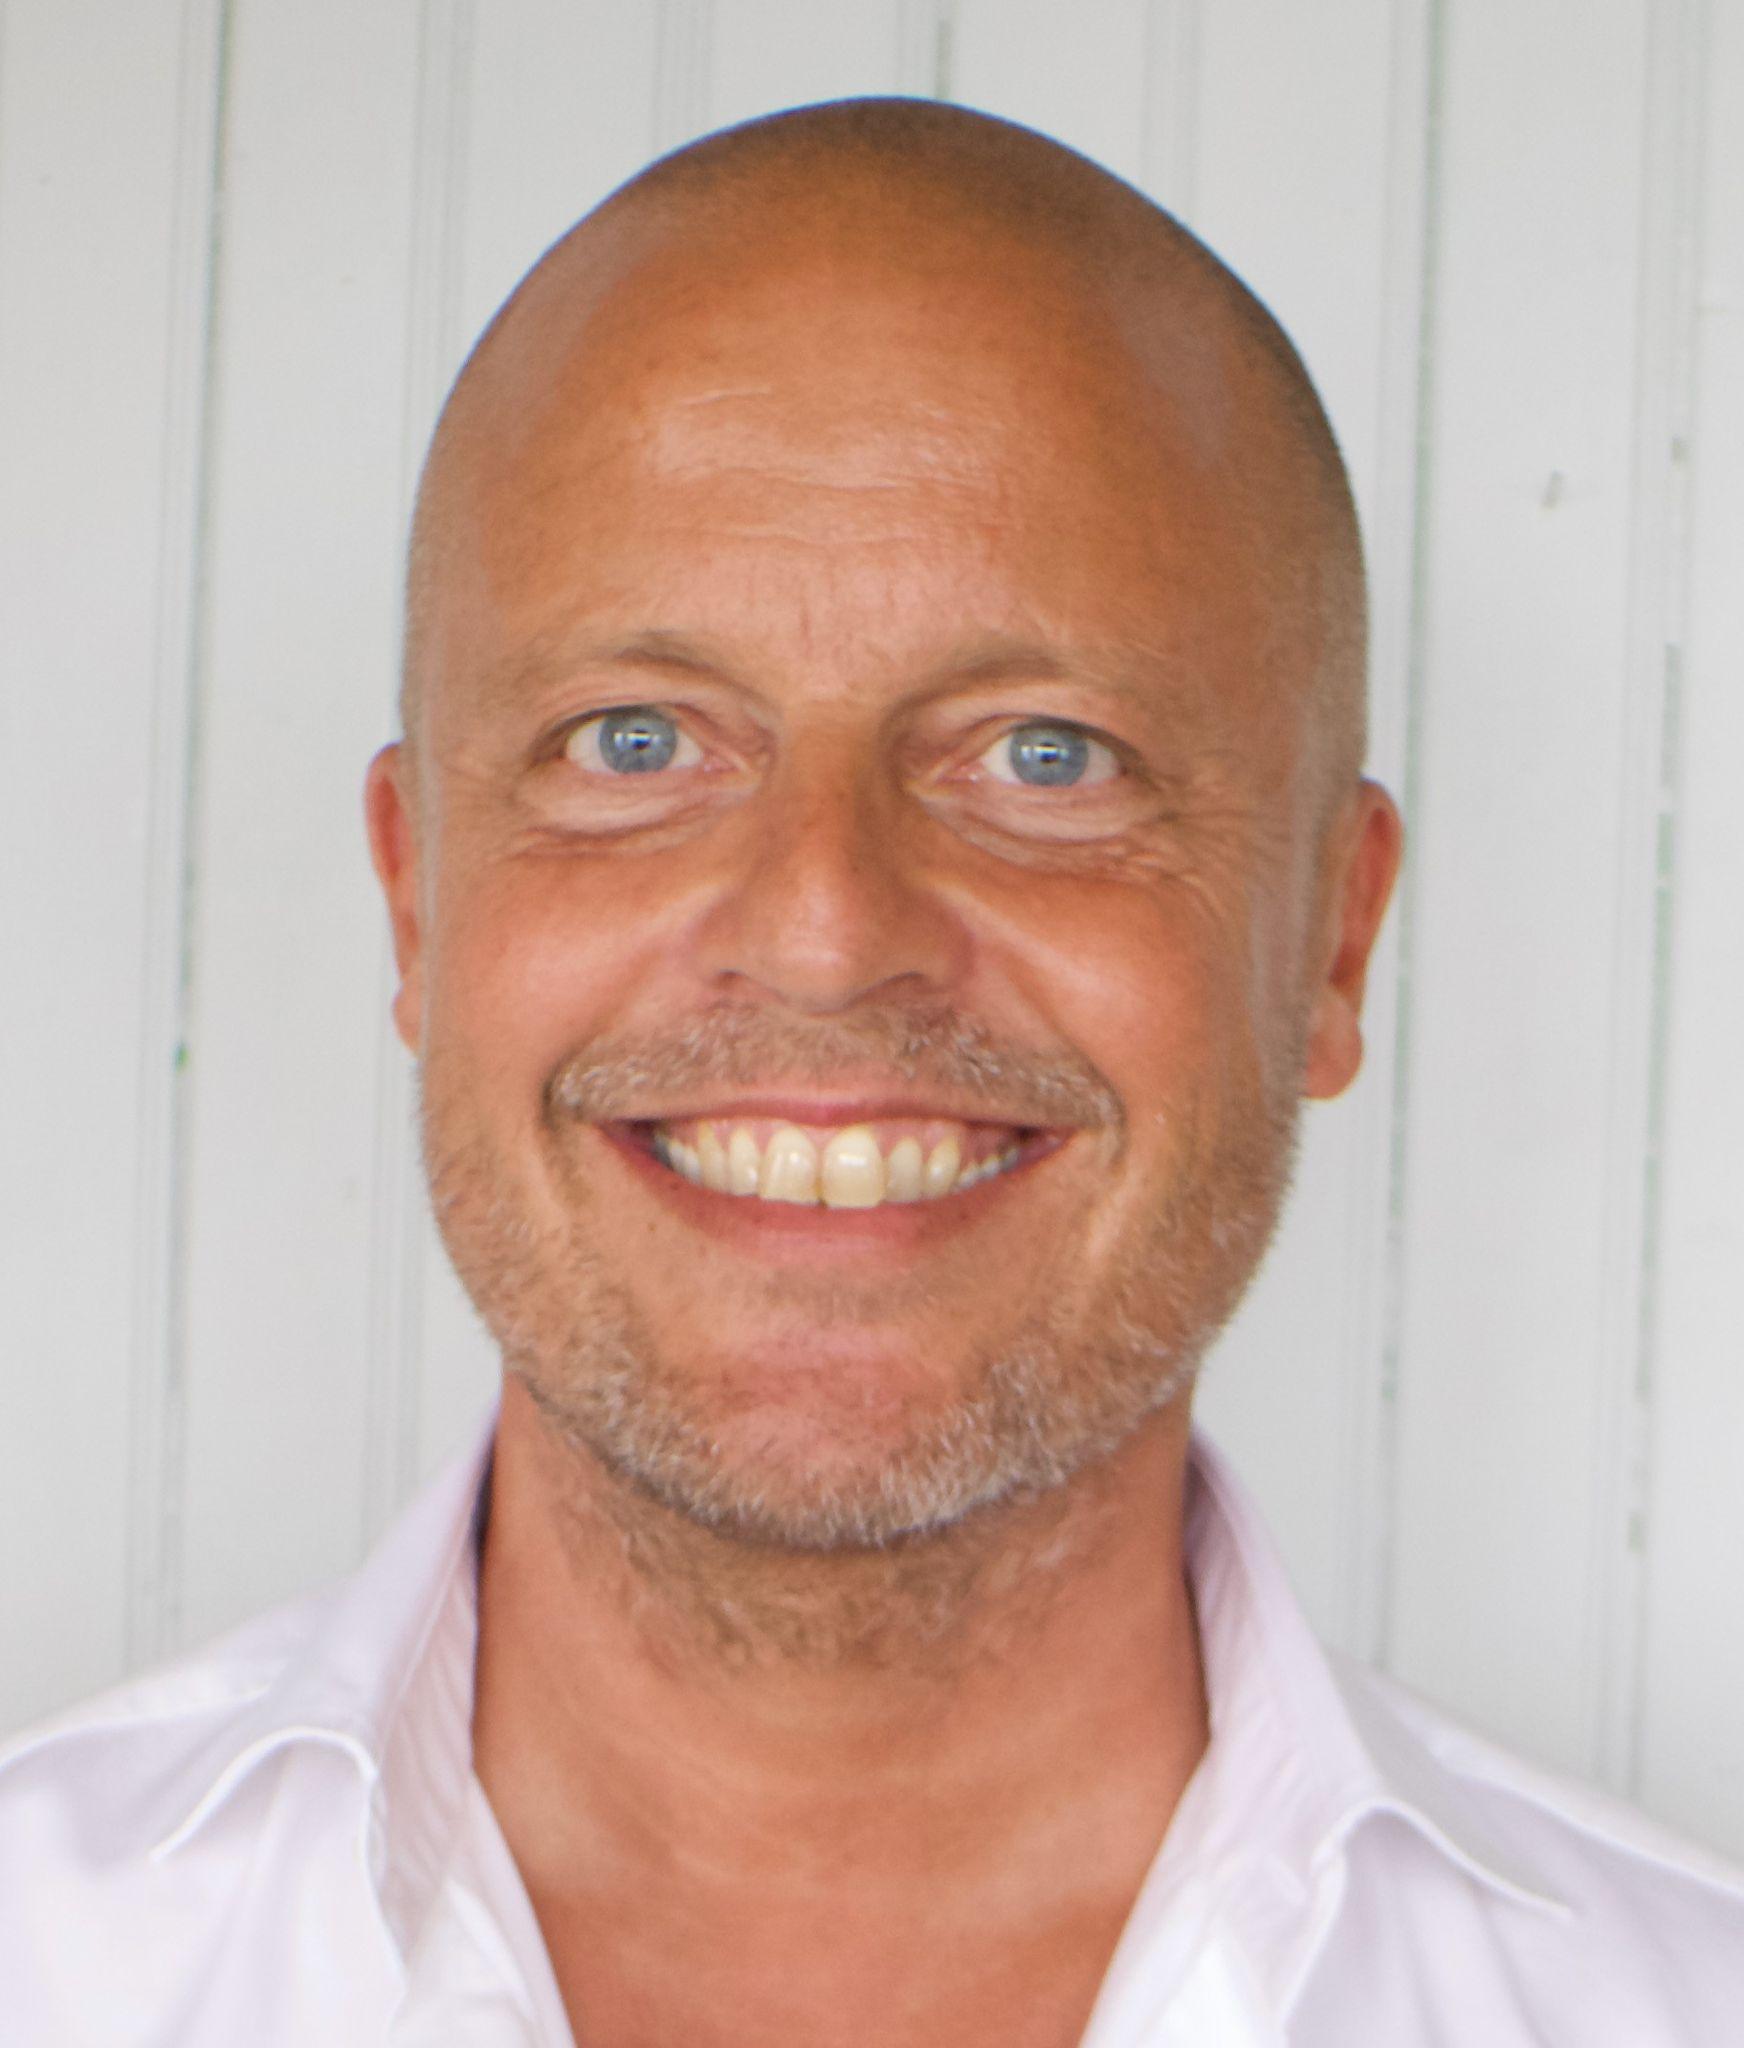 Lars A. Engberg